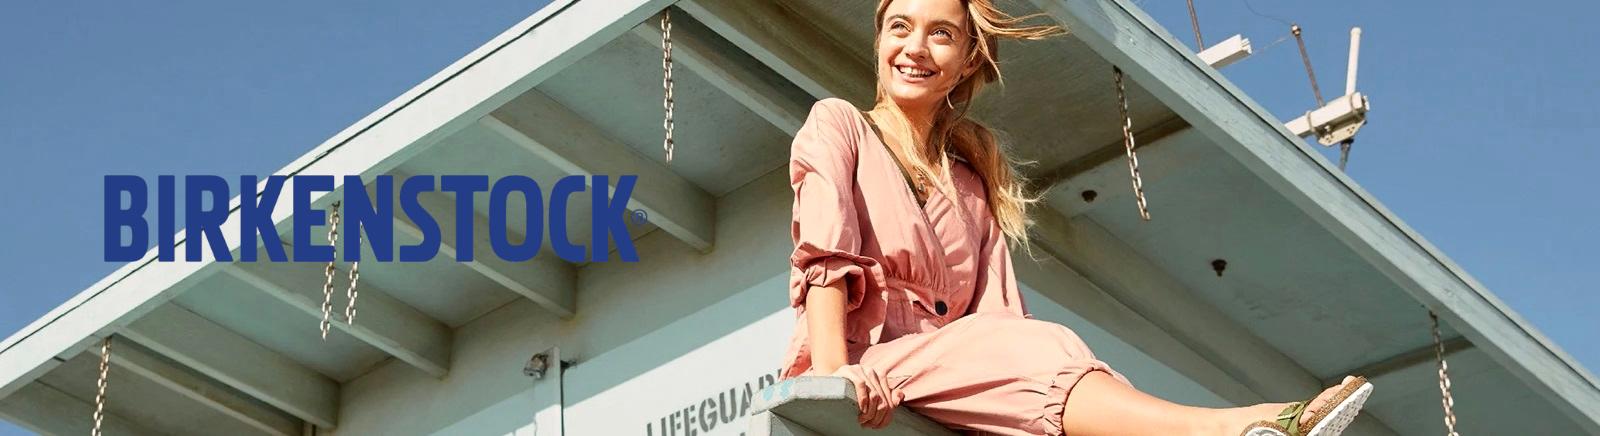 Birkenstock Markenschuhe online entdecken im Juppen Shop